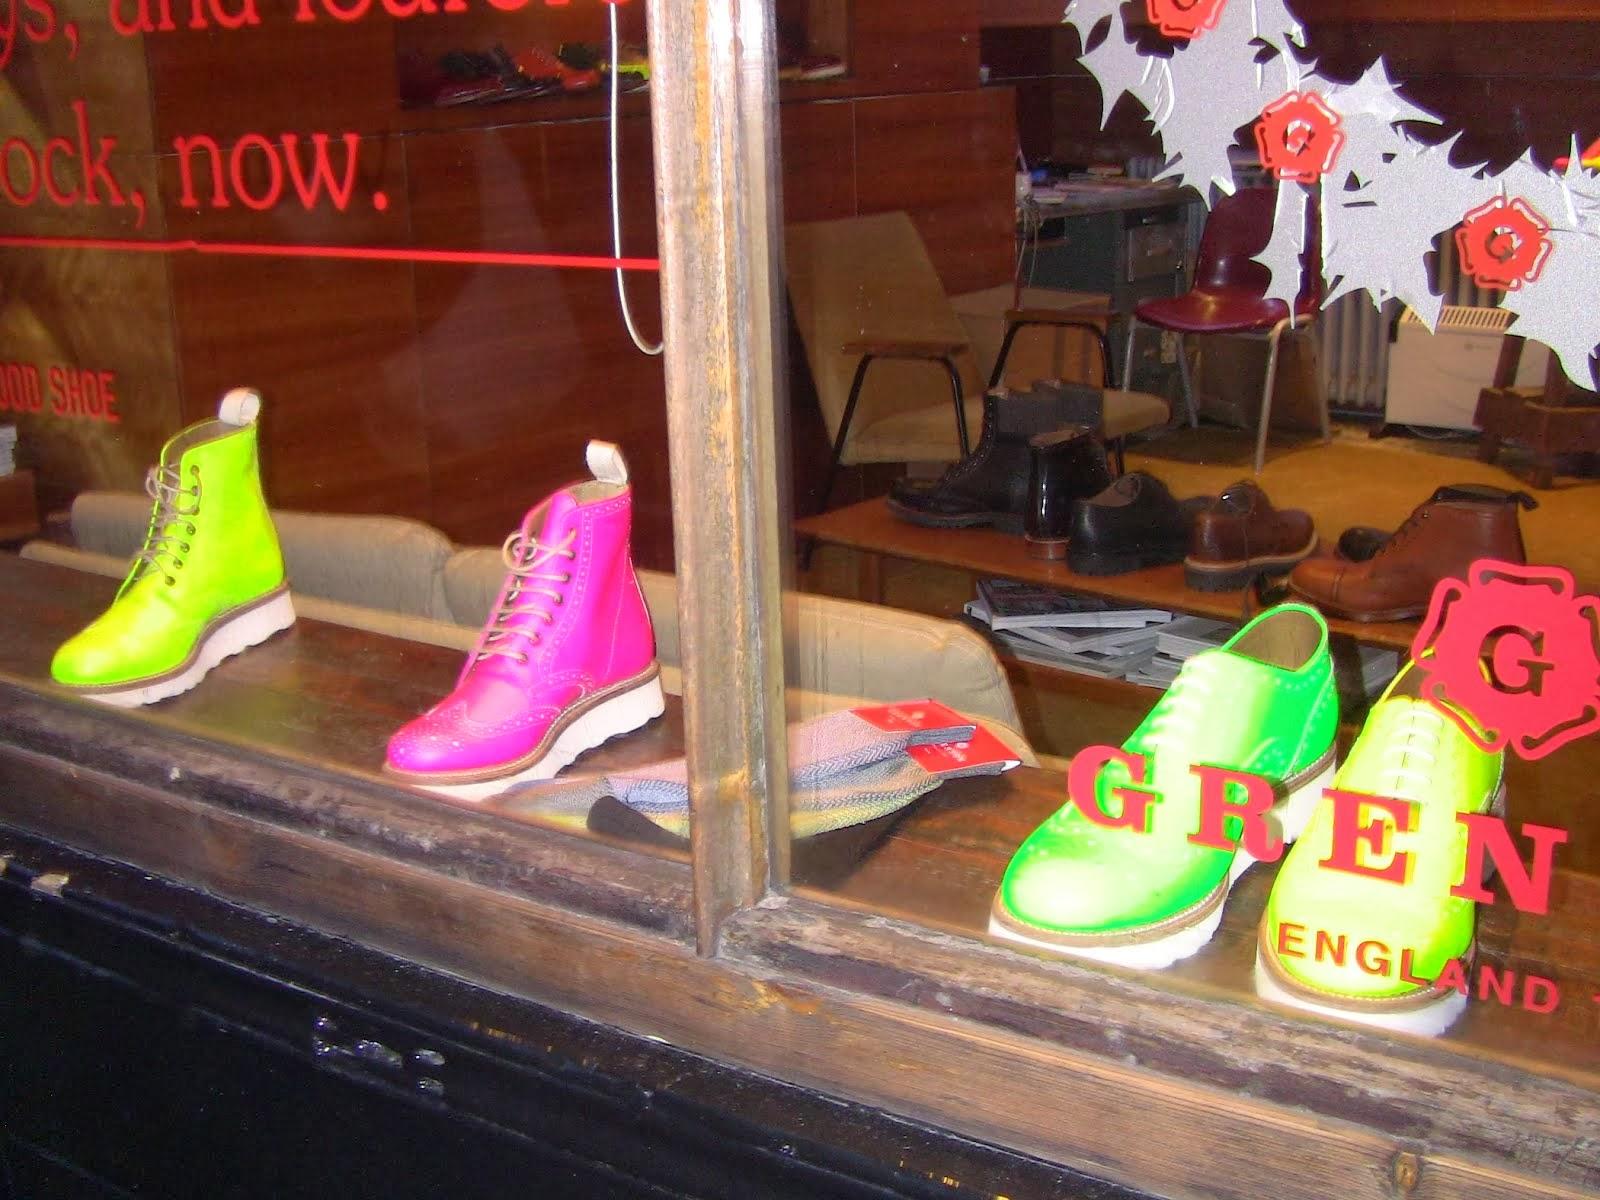 des chaussures chic et choc!